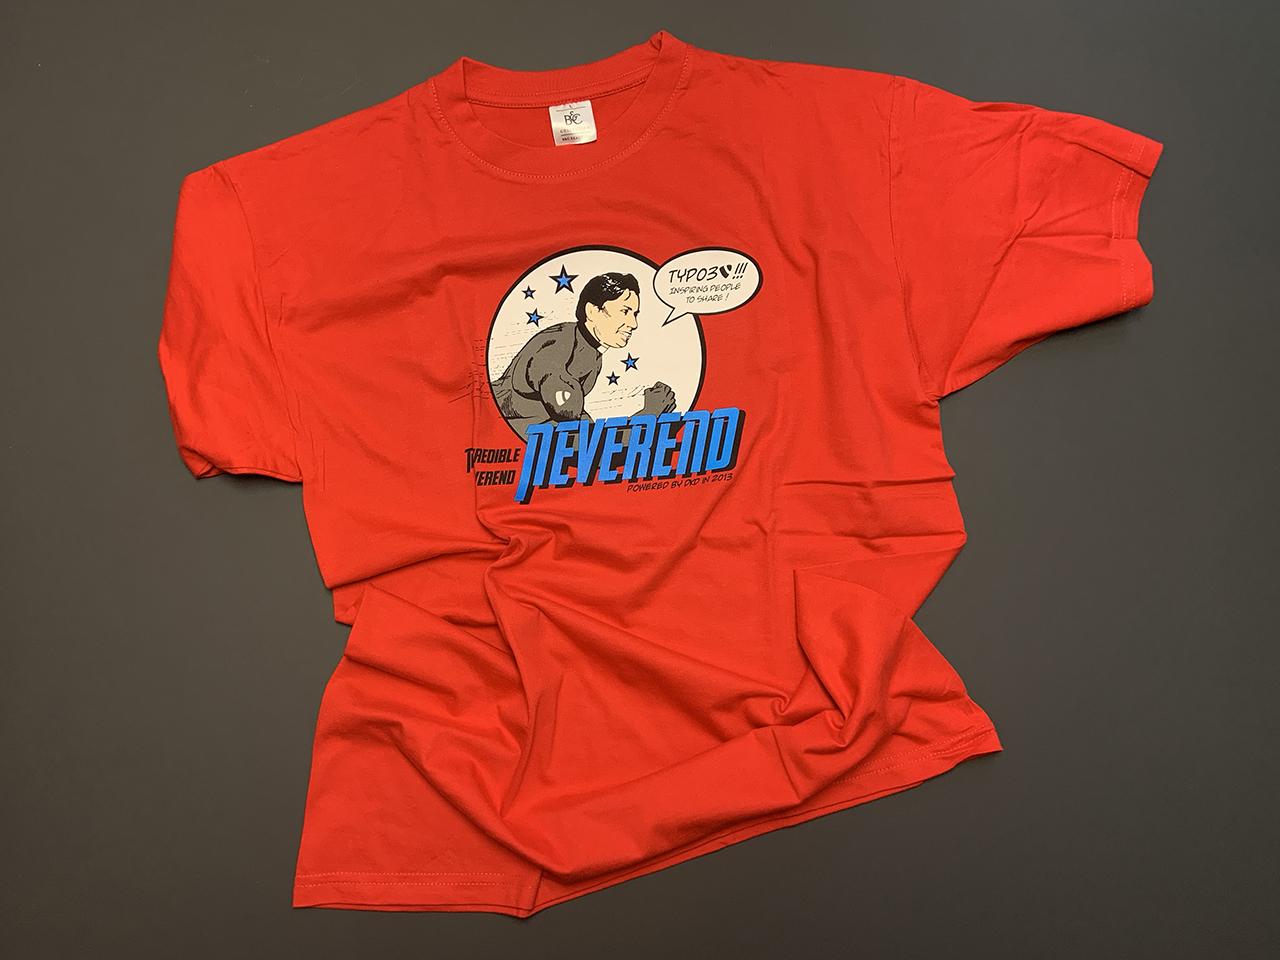 Rotes Shirt mit Comic-Druck